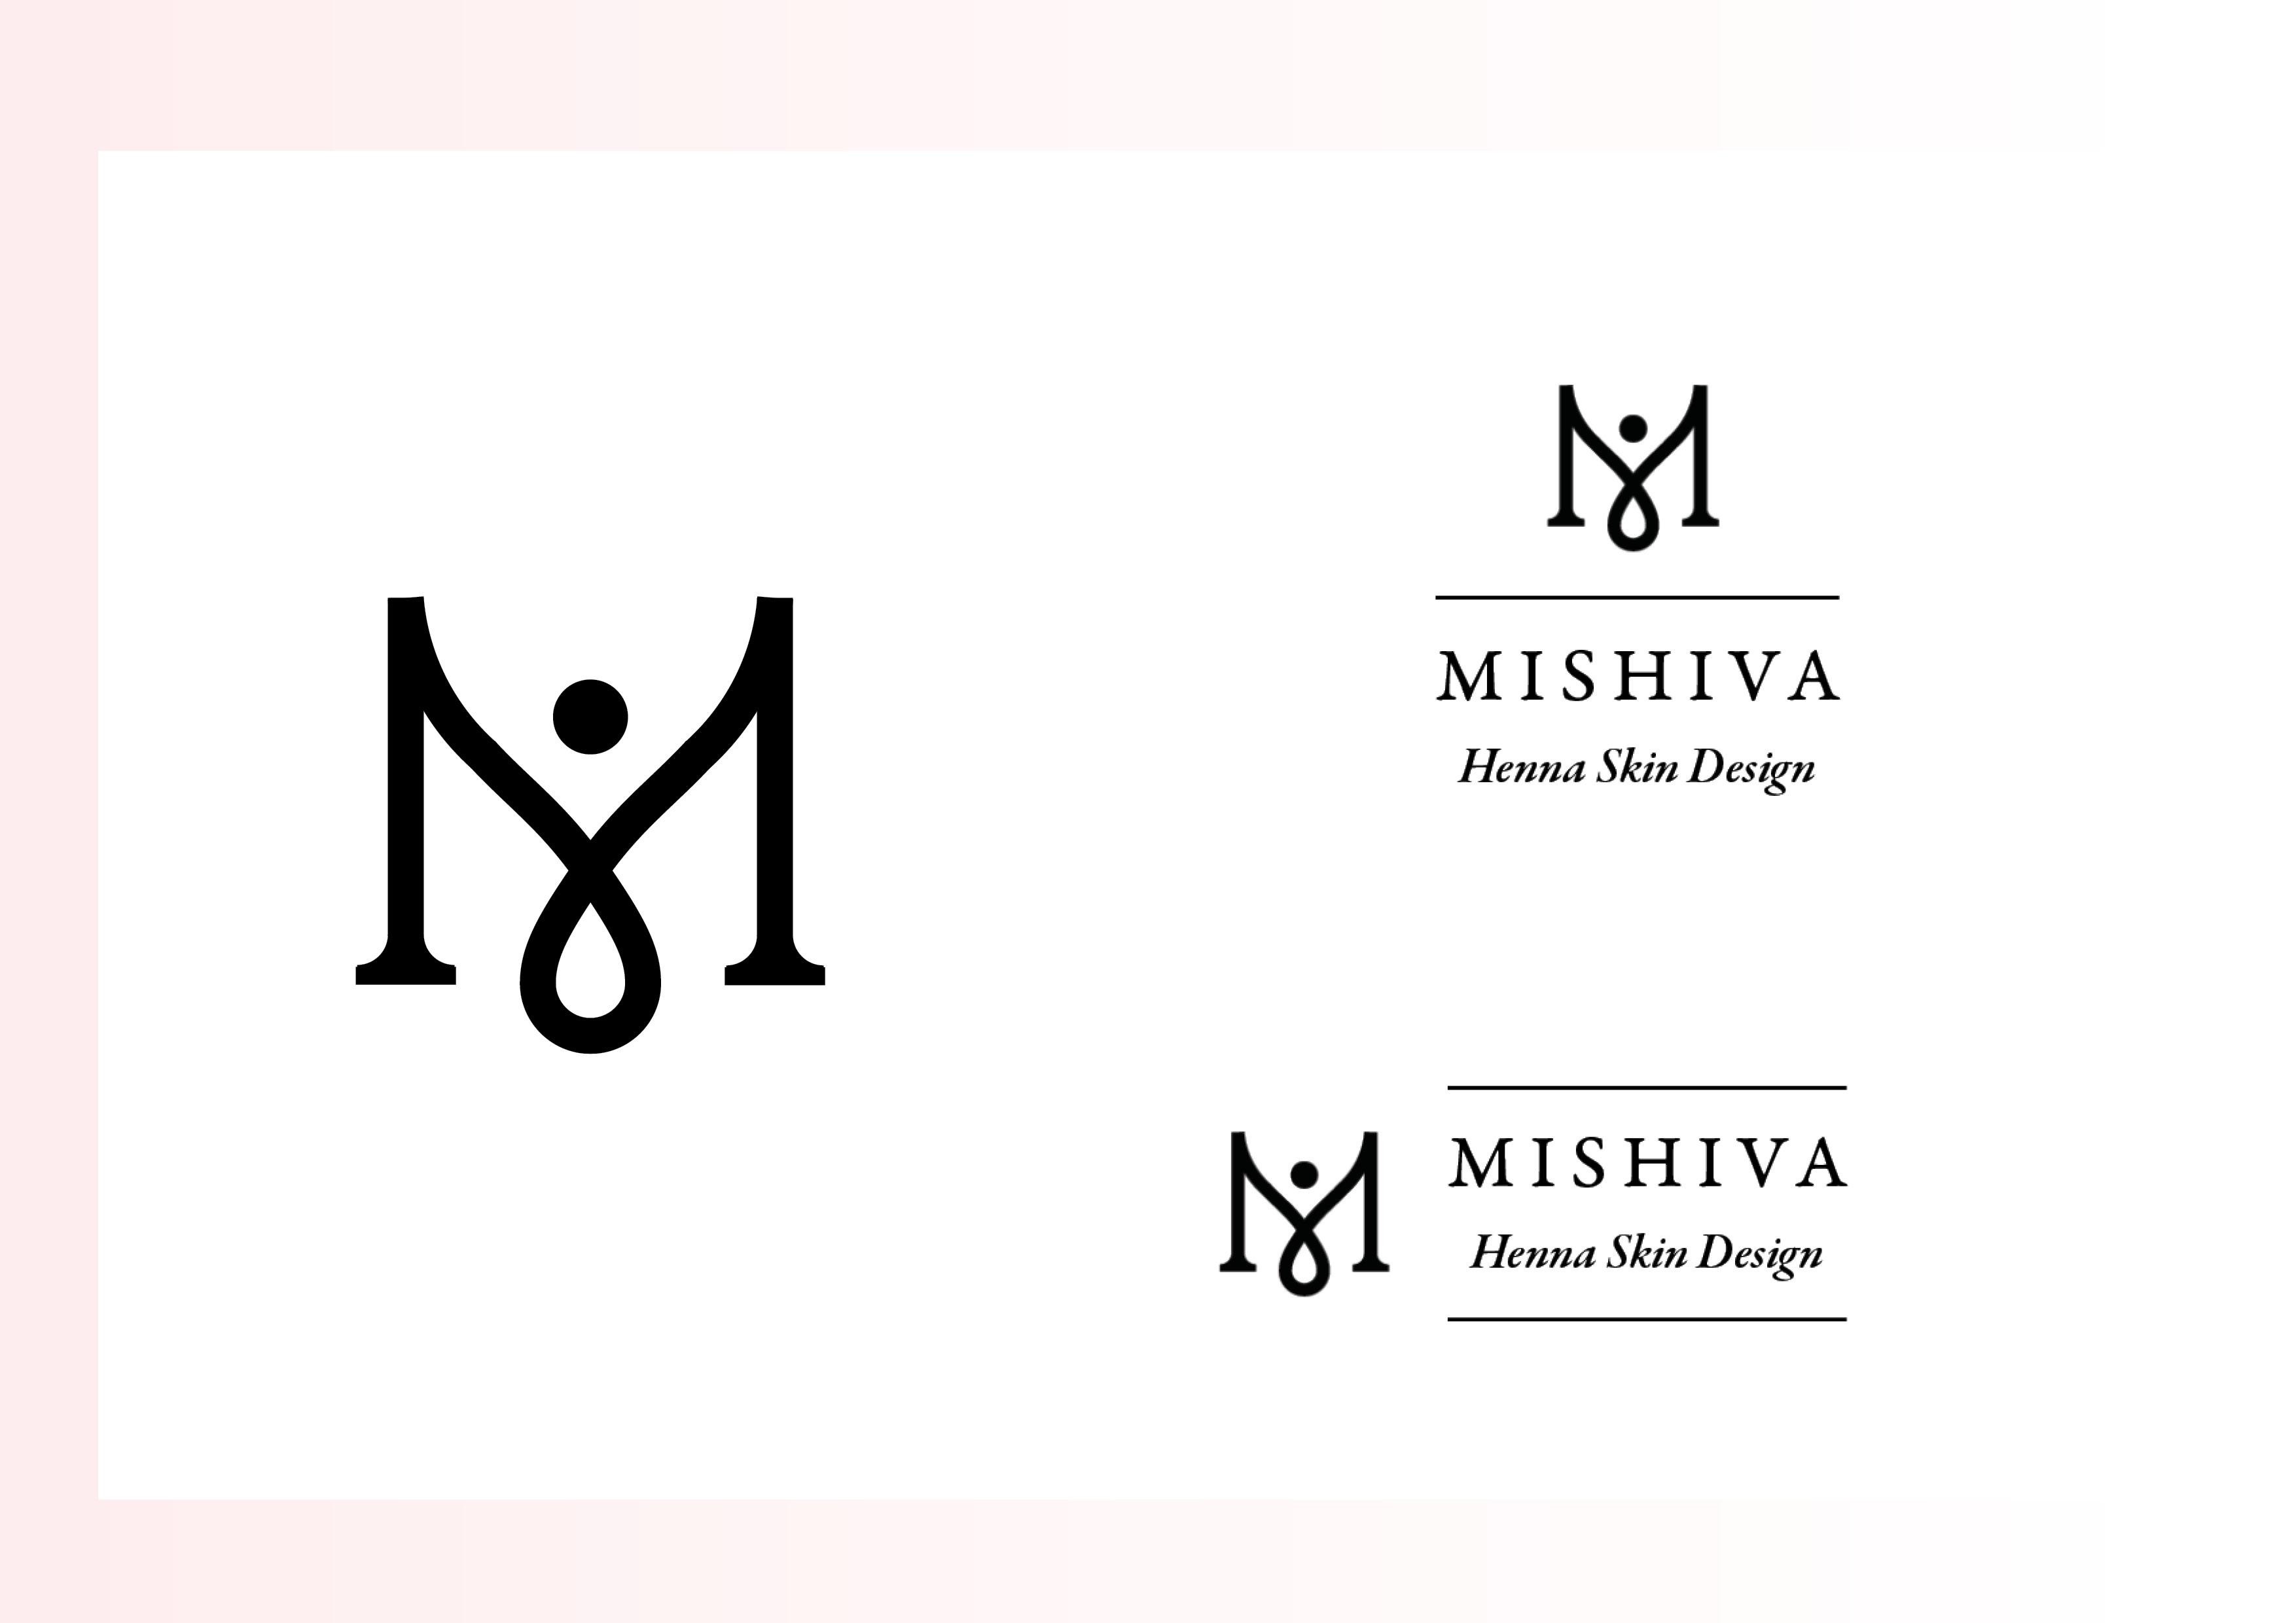 Identidad corporativa Mishiva